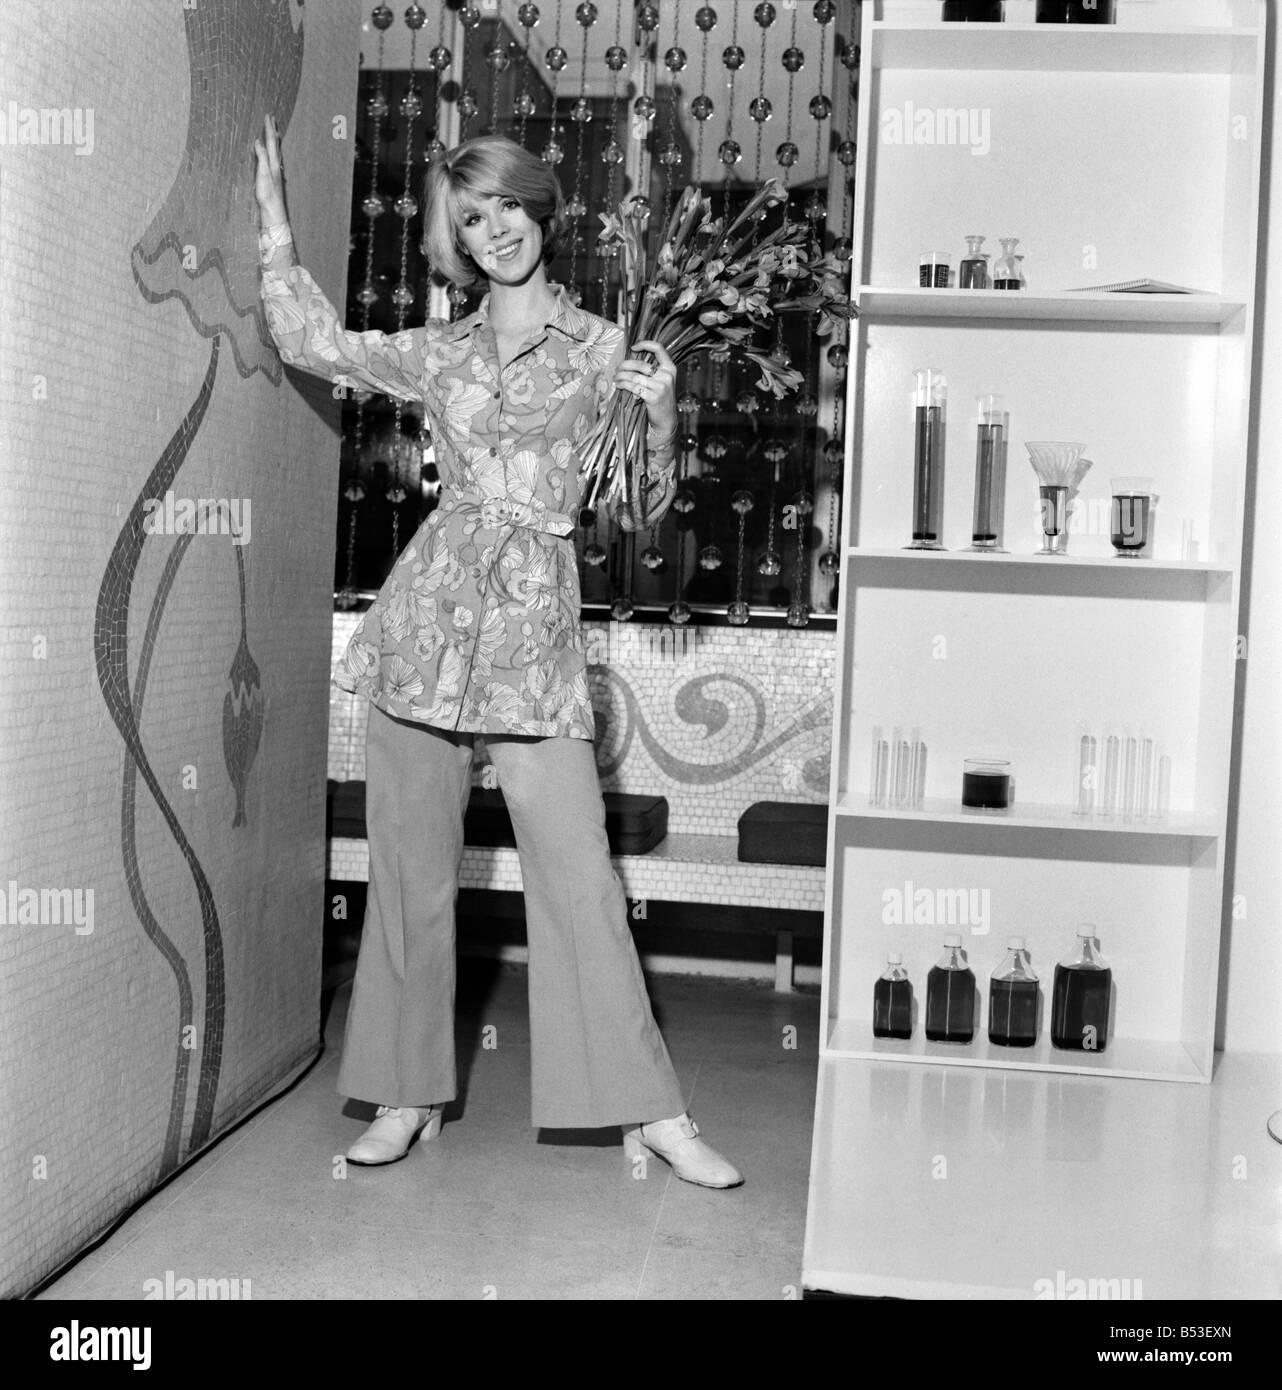 70s Fashion Stockfotos & 70s Fashion Bilder - Alamy